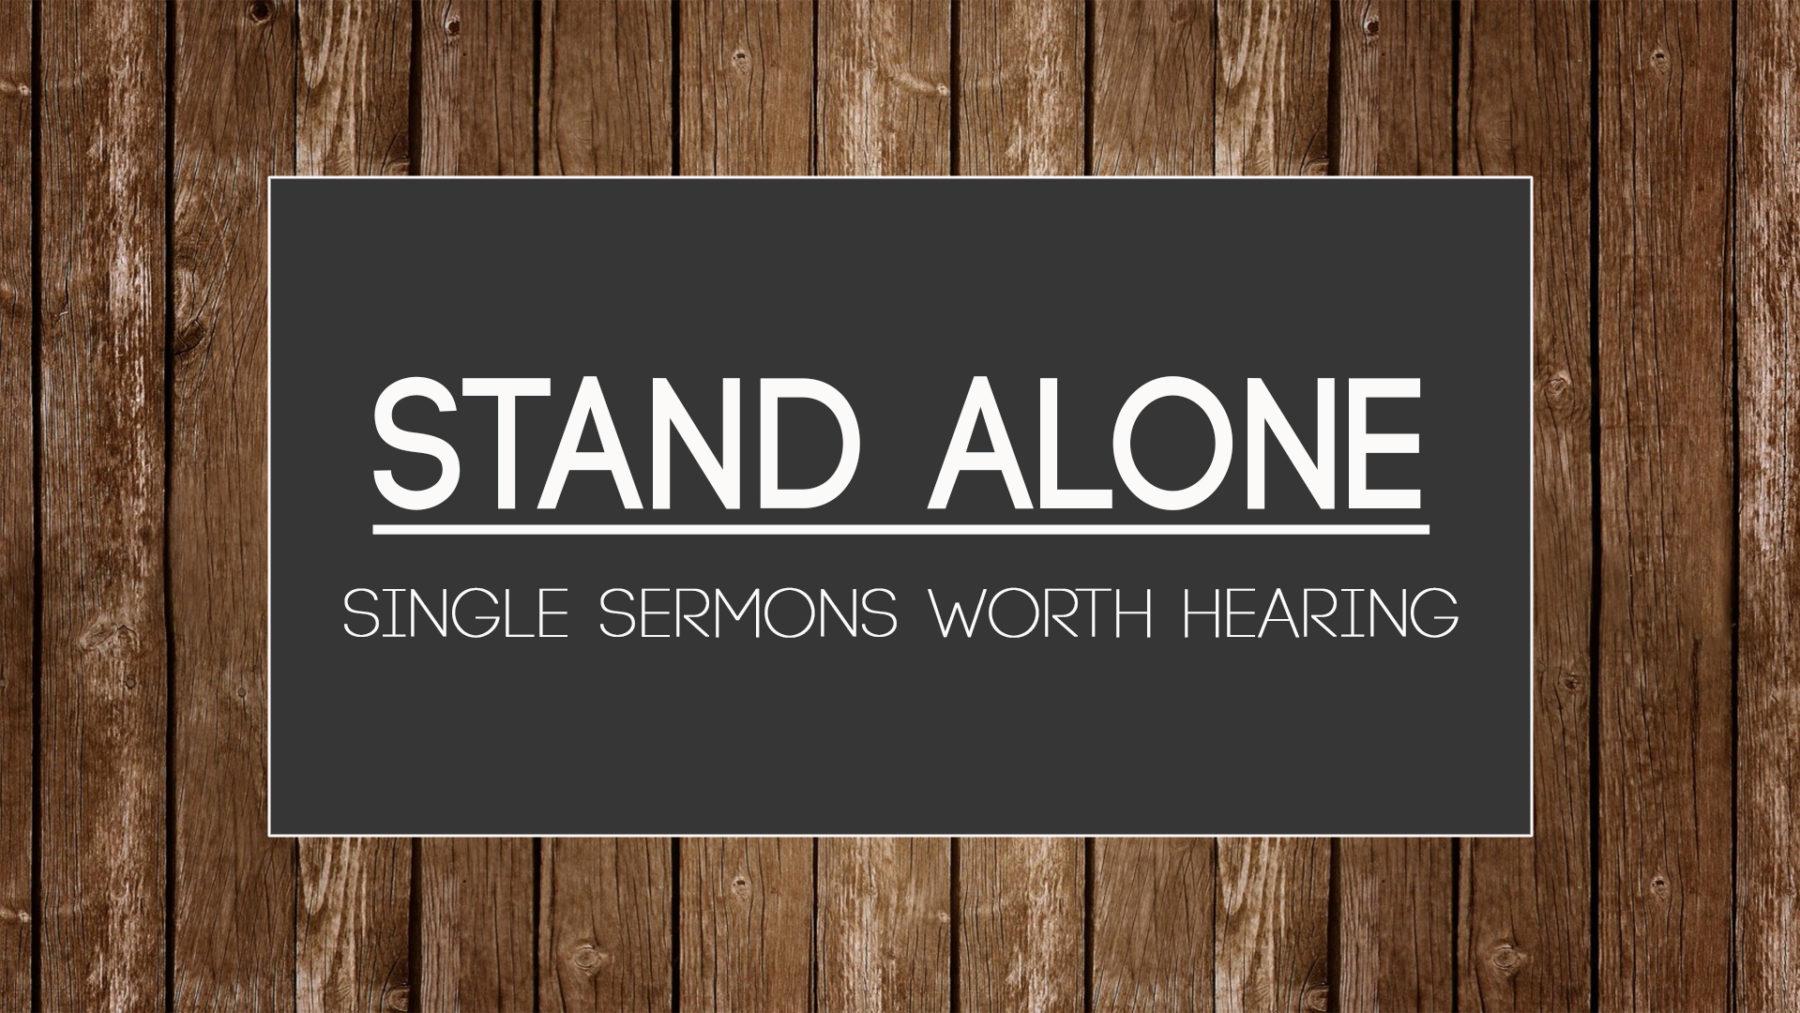 Stand Alone Sermons Image.jpg